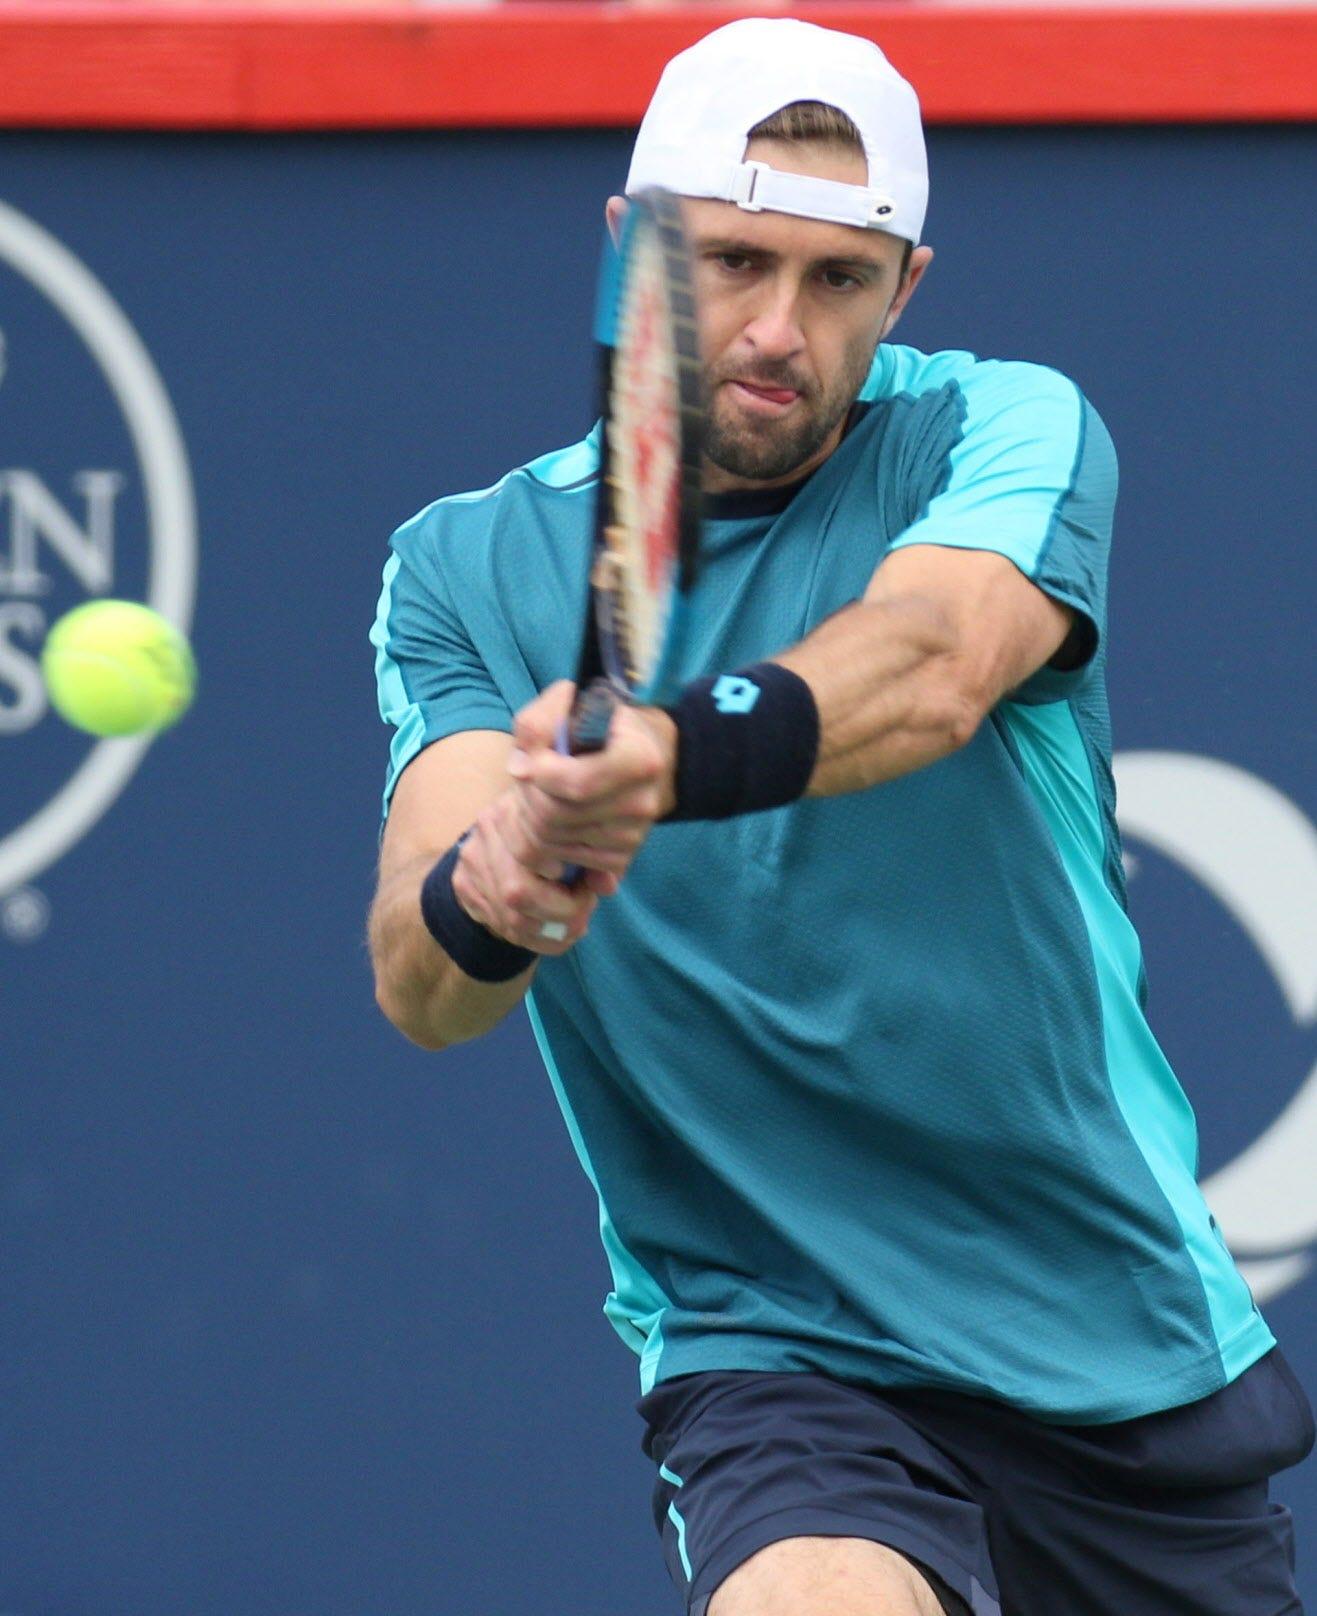 Tim Smyczek Tennis Prediction Picks - image 7